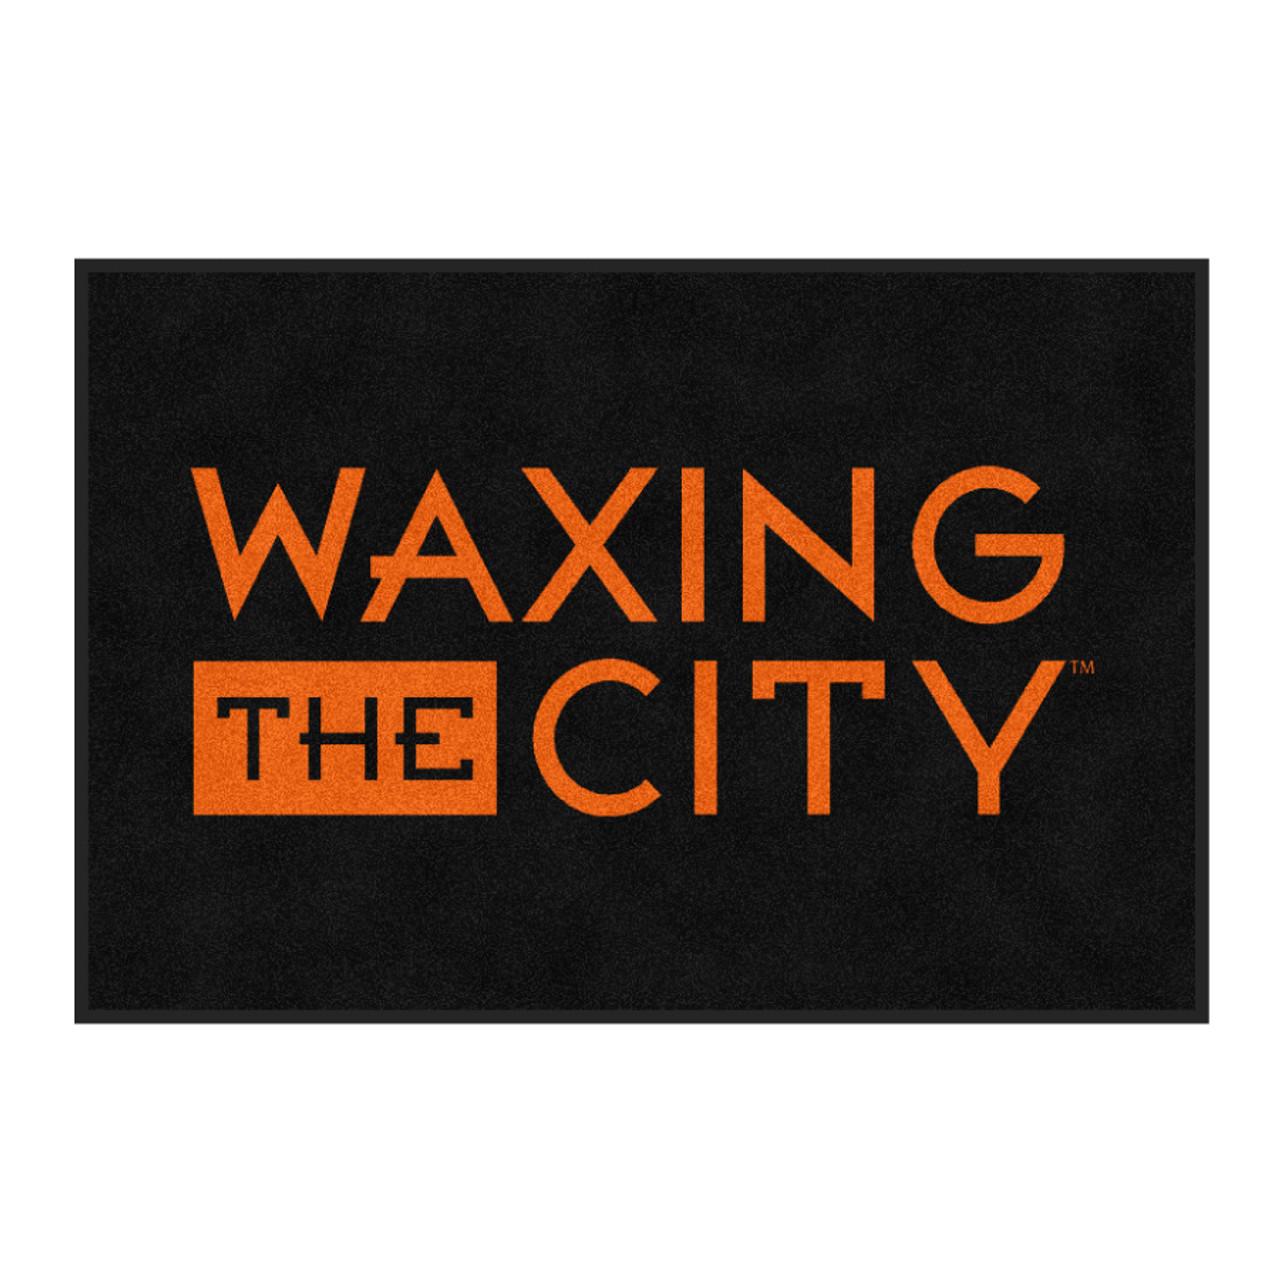 Ass Ic m+a matting waxing the city logo classic impressions, interior wiper mat, 70